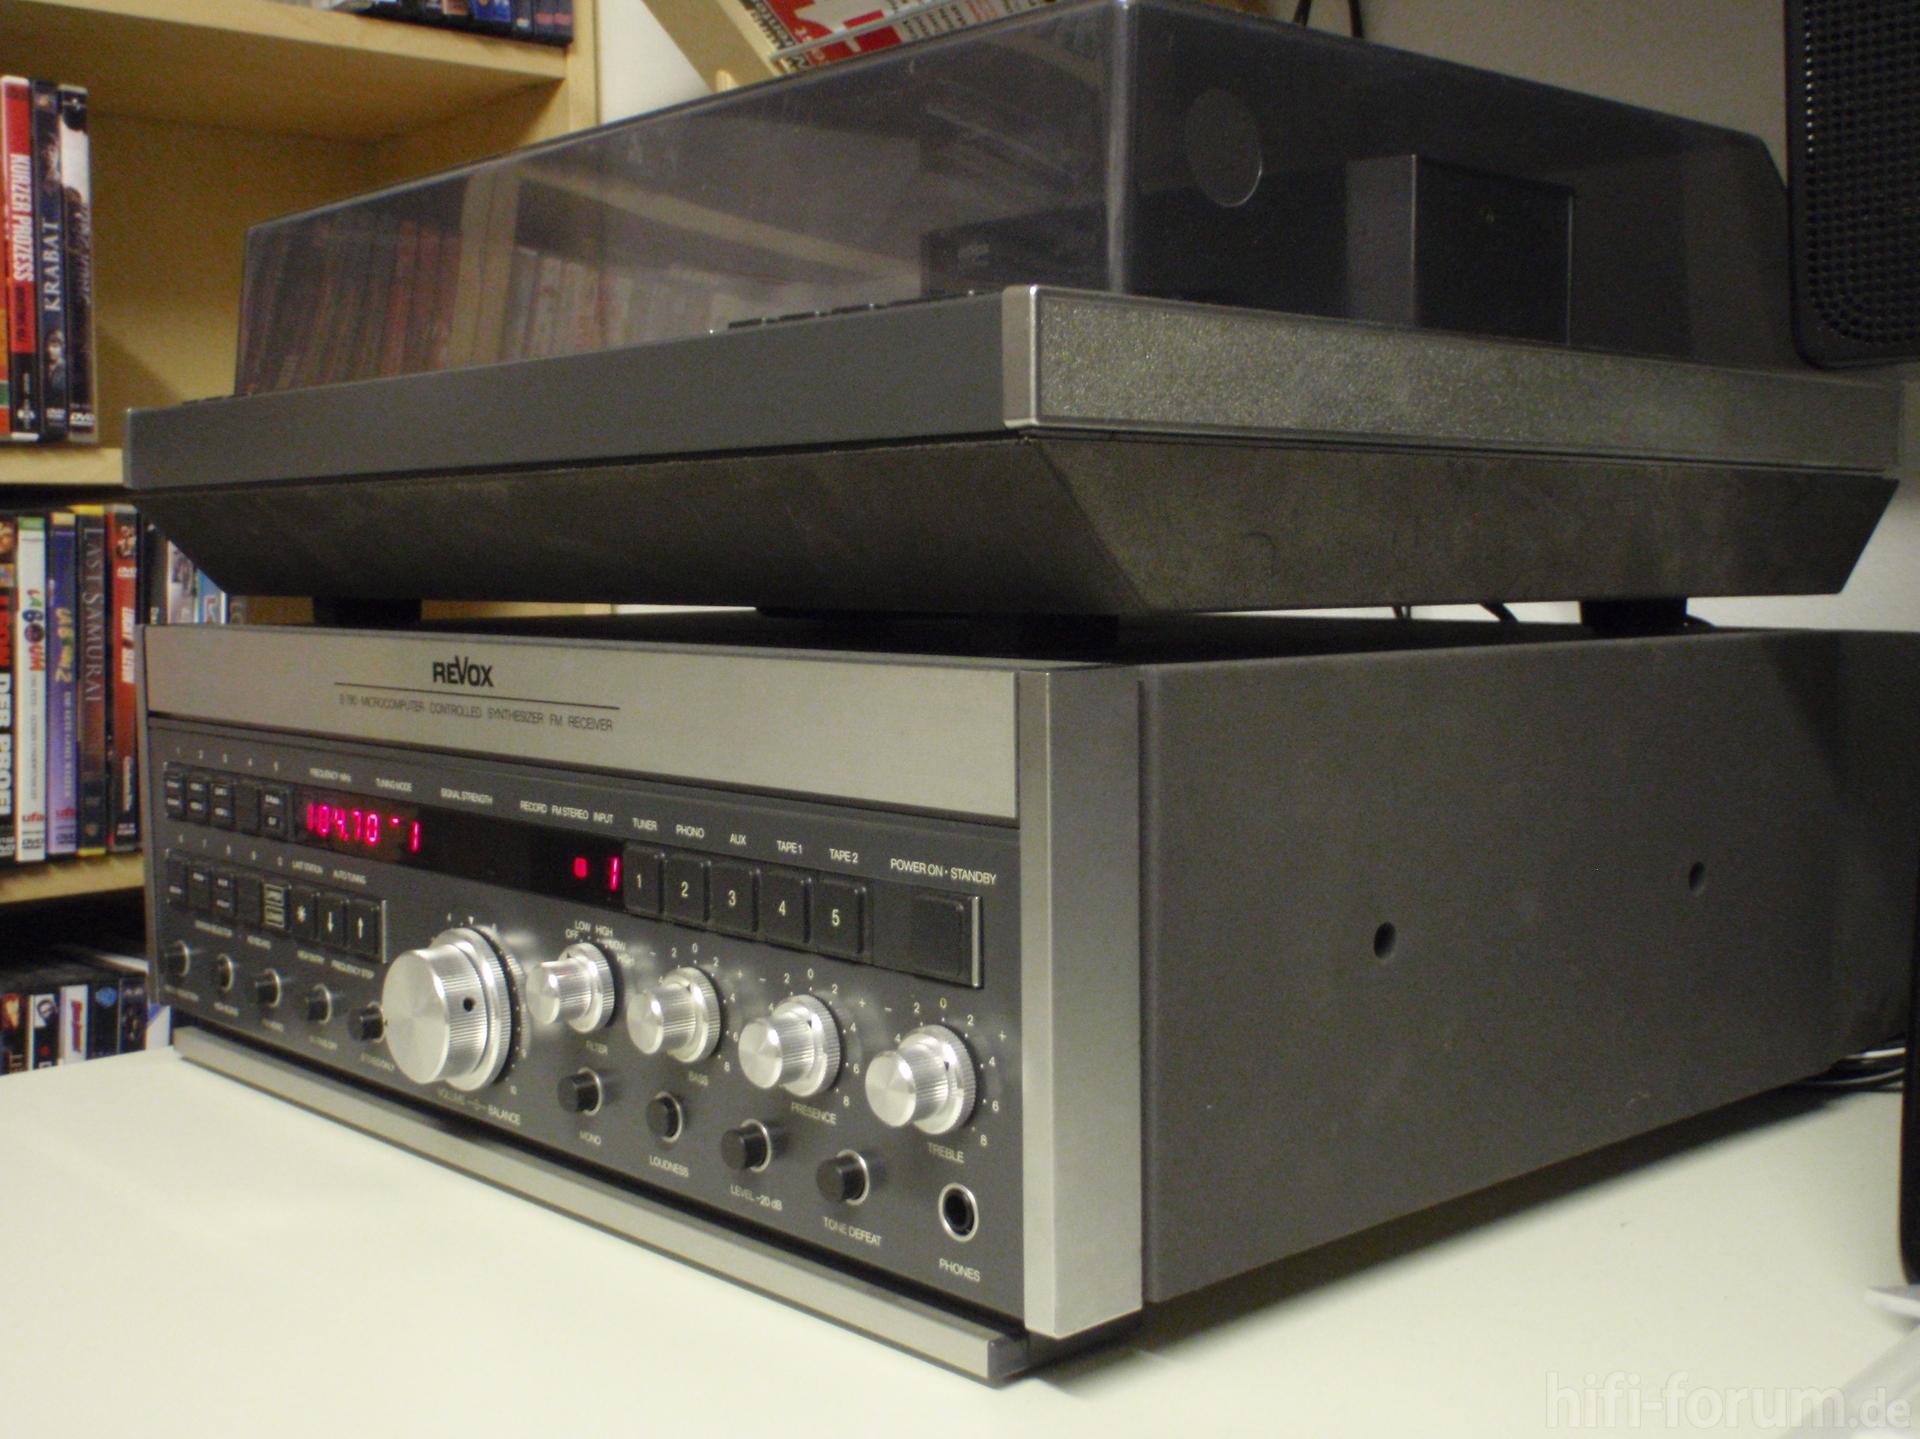 b780 und b790 kante b780 b790 hifiklassiker kante stereo hifi bildergalerie. Black Bedroom Furniture Sets. Home Design Ideas